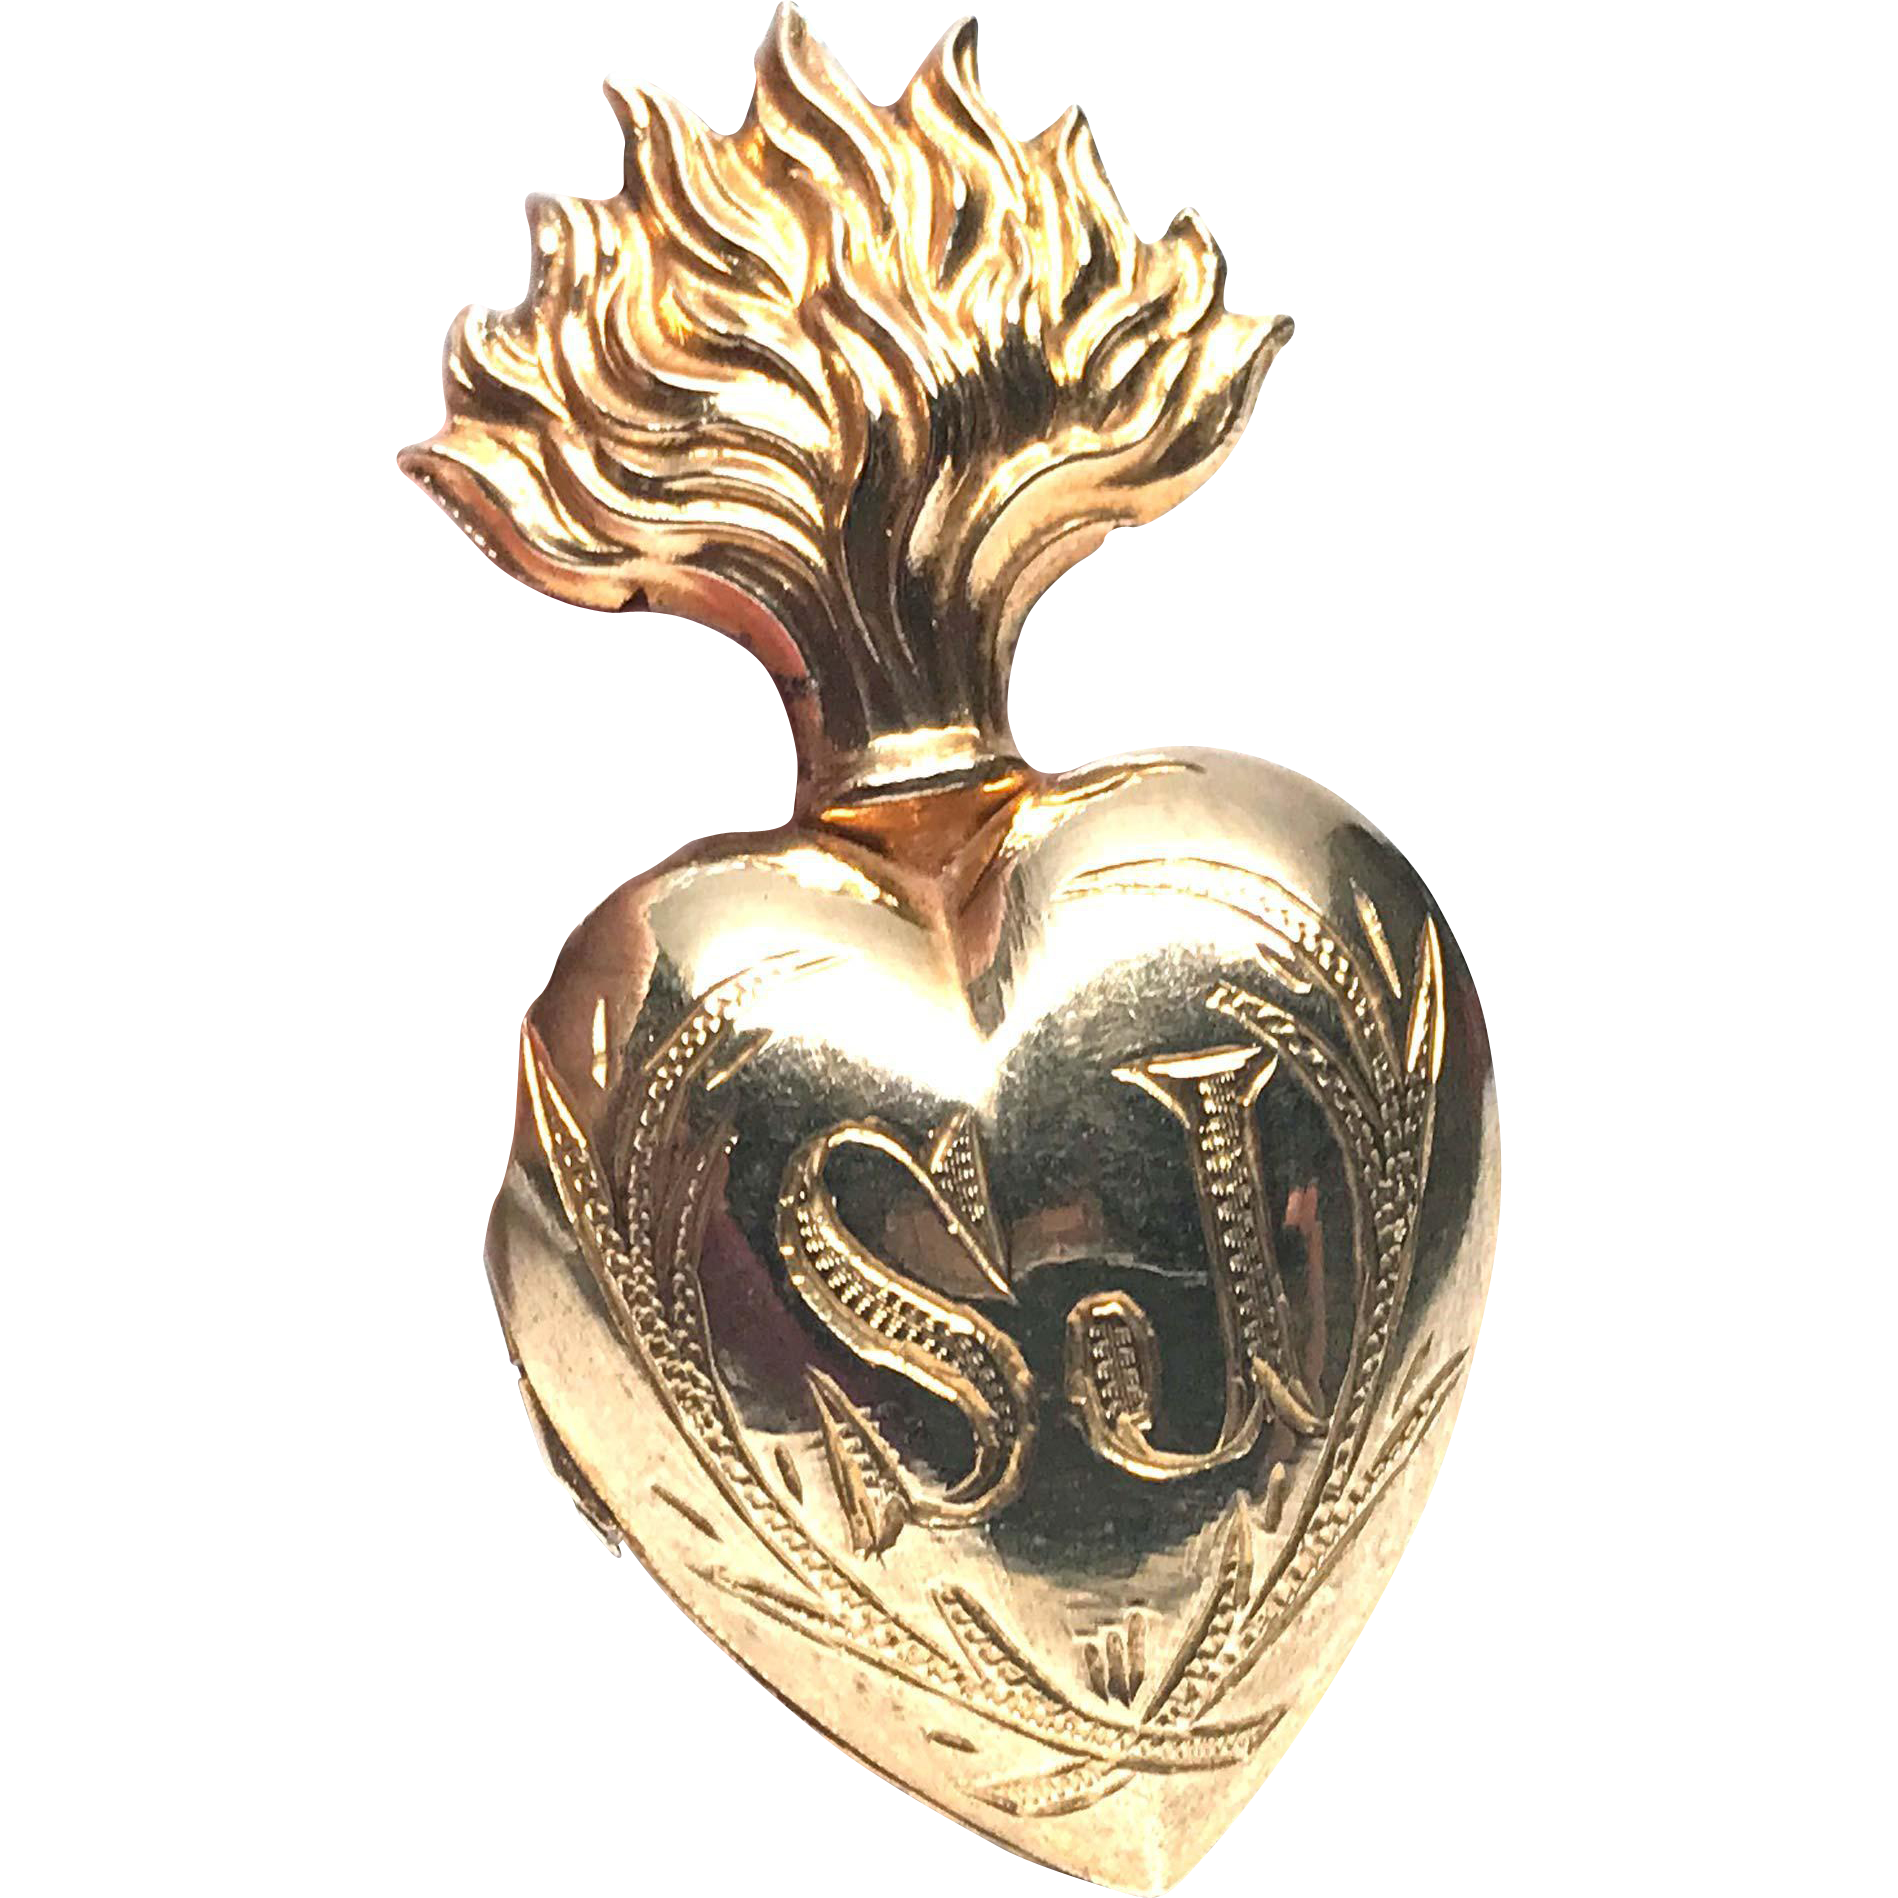 TINY Antique Nineteenth Century Gilded Brass Sacred Heart Ex Voto with Monogram SJ